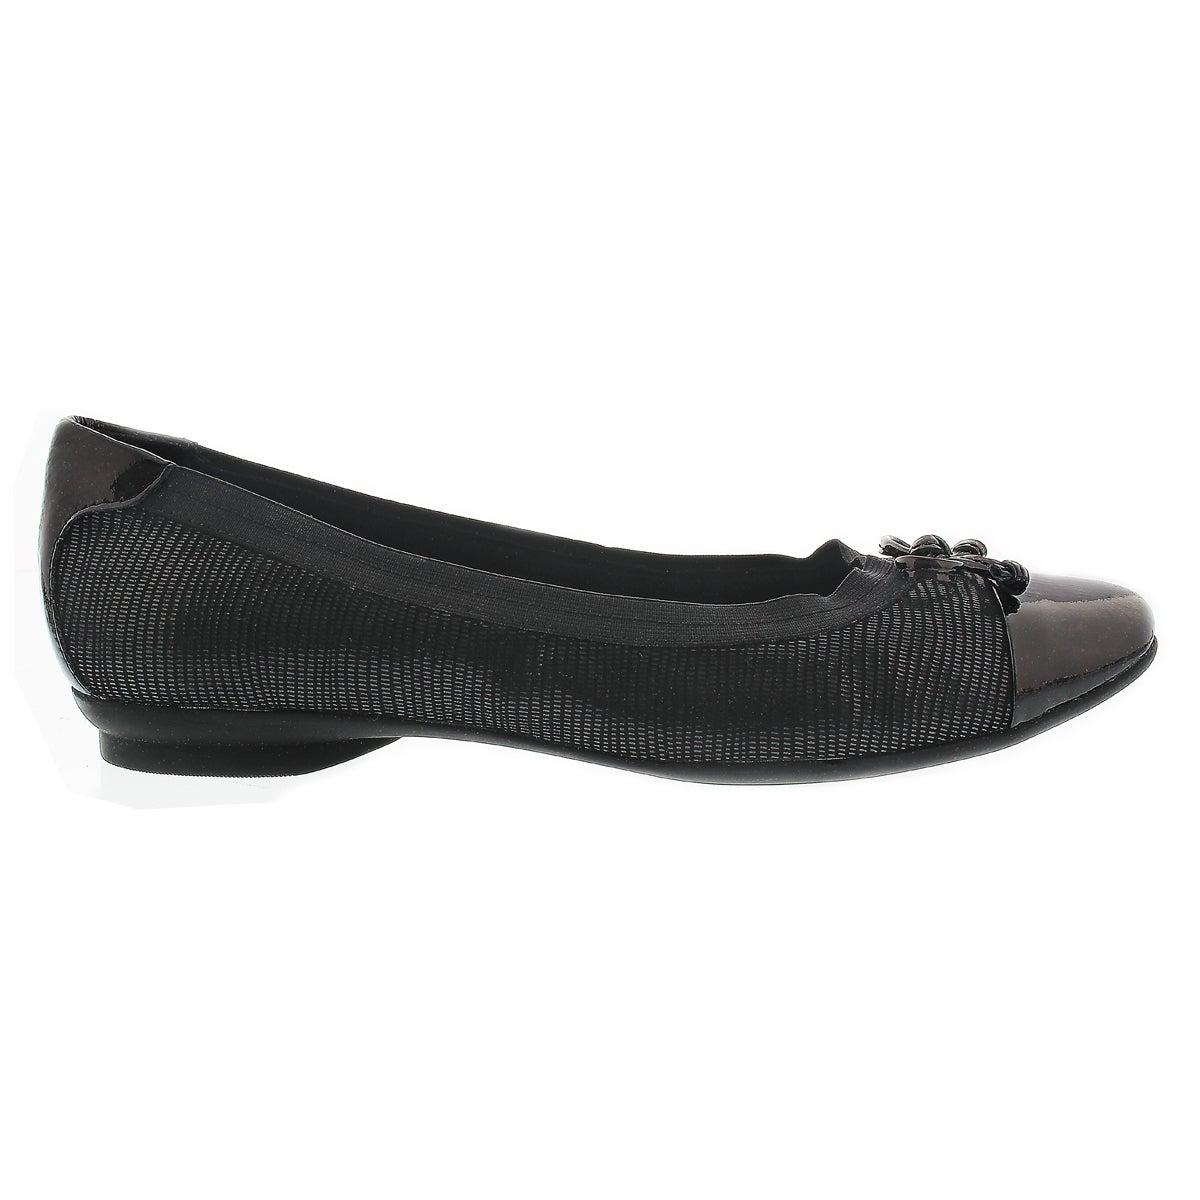 Lds Candra Glow black slip on dress flat